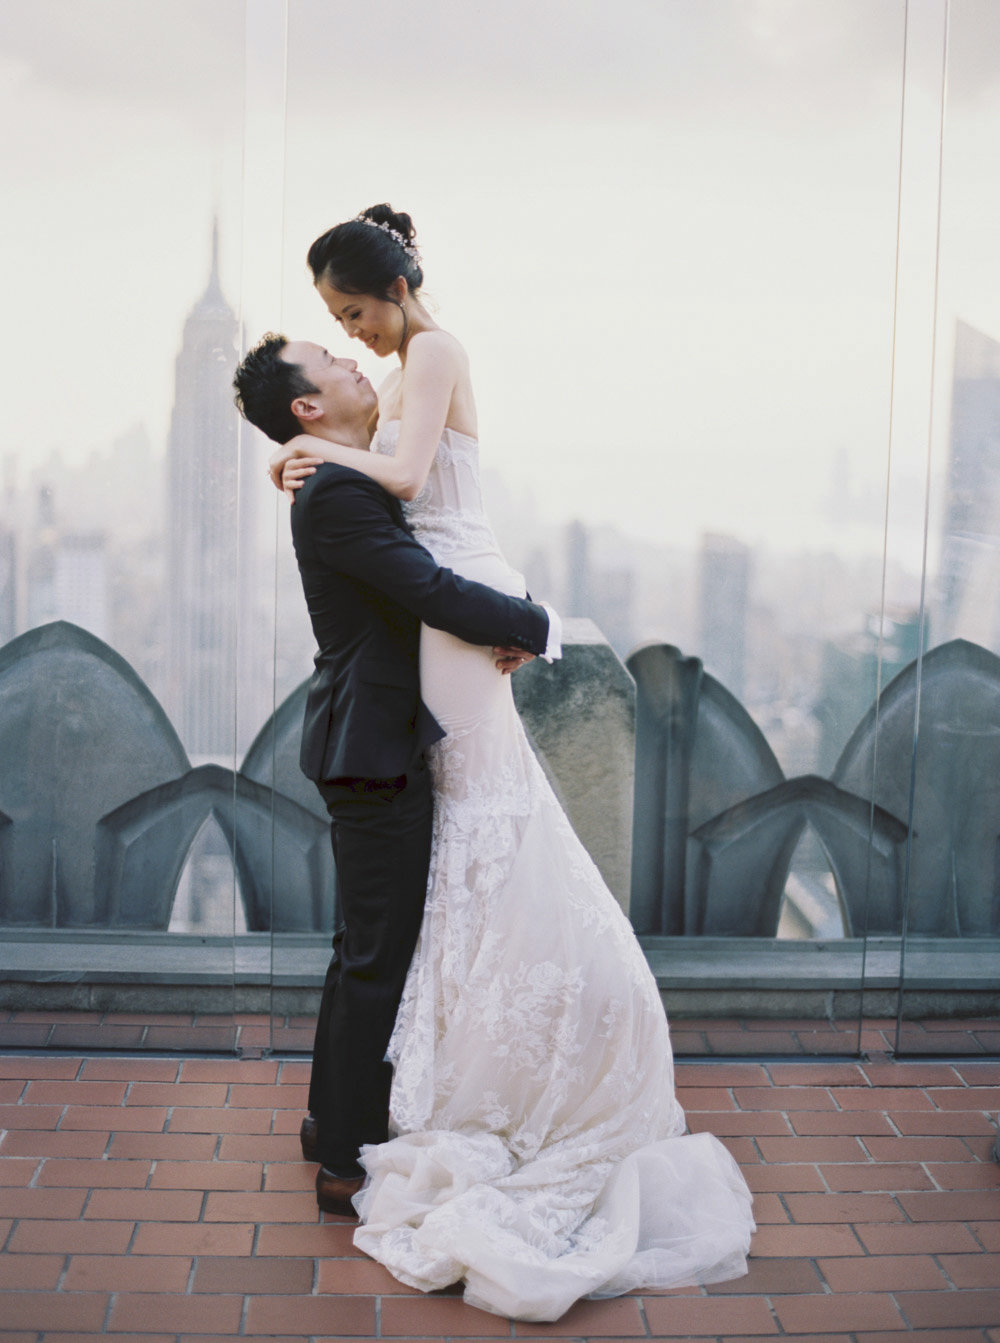 Joe+Lengson+Film+Wedding+Photography+NYC--21.jpg